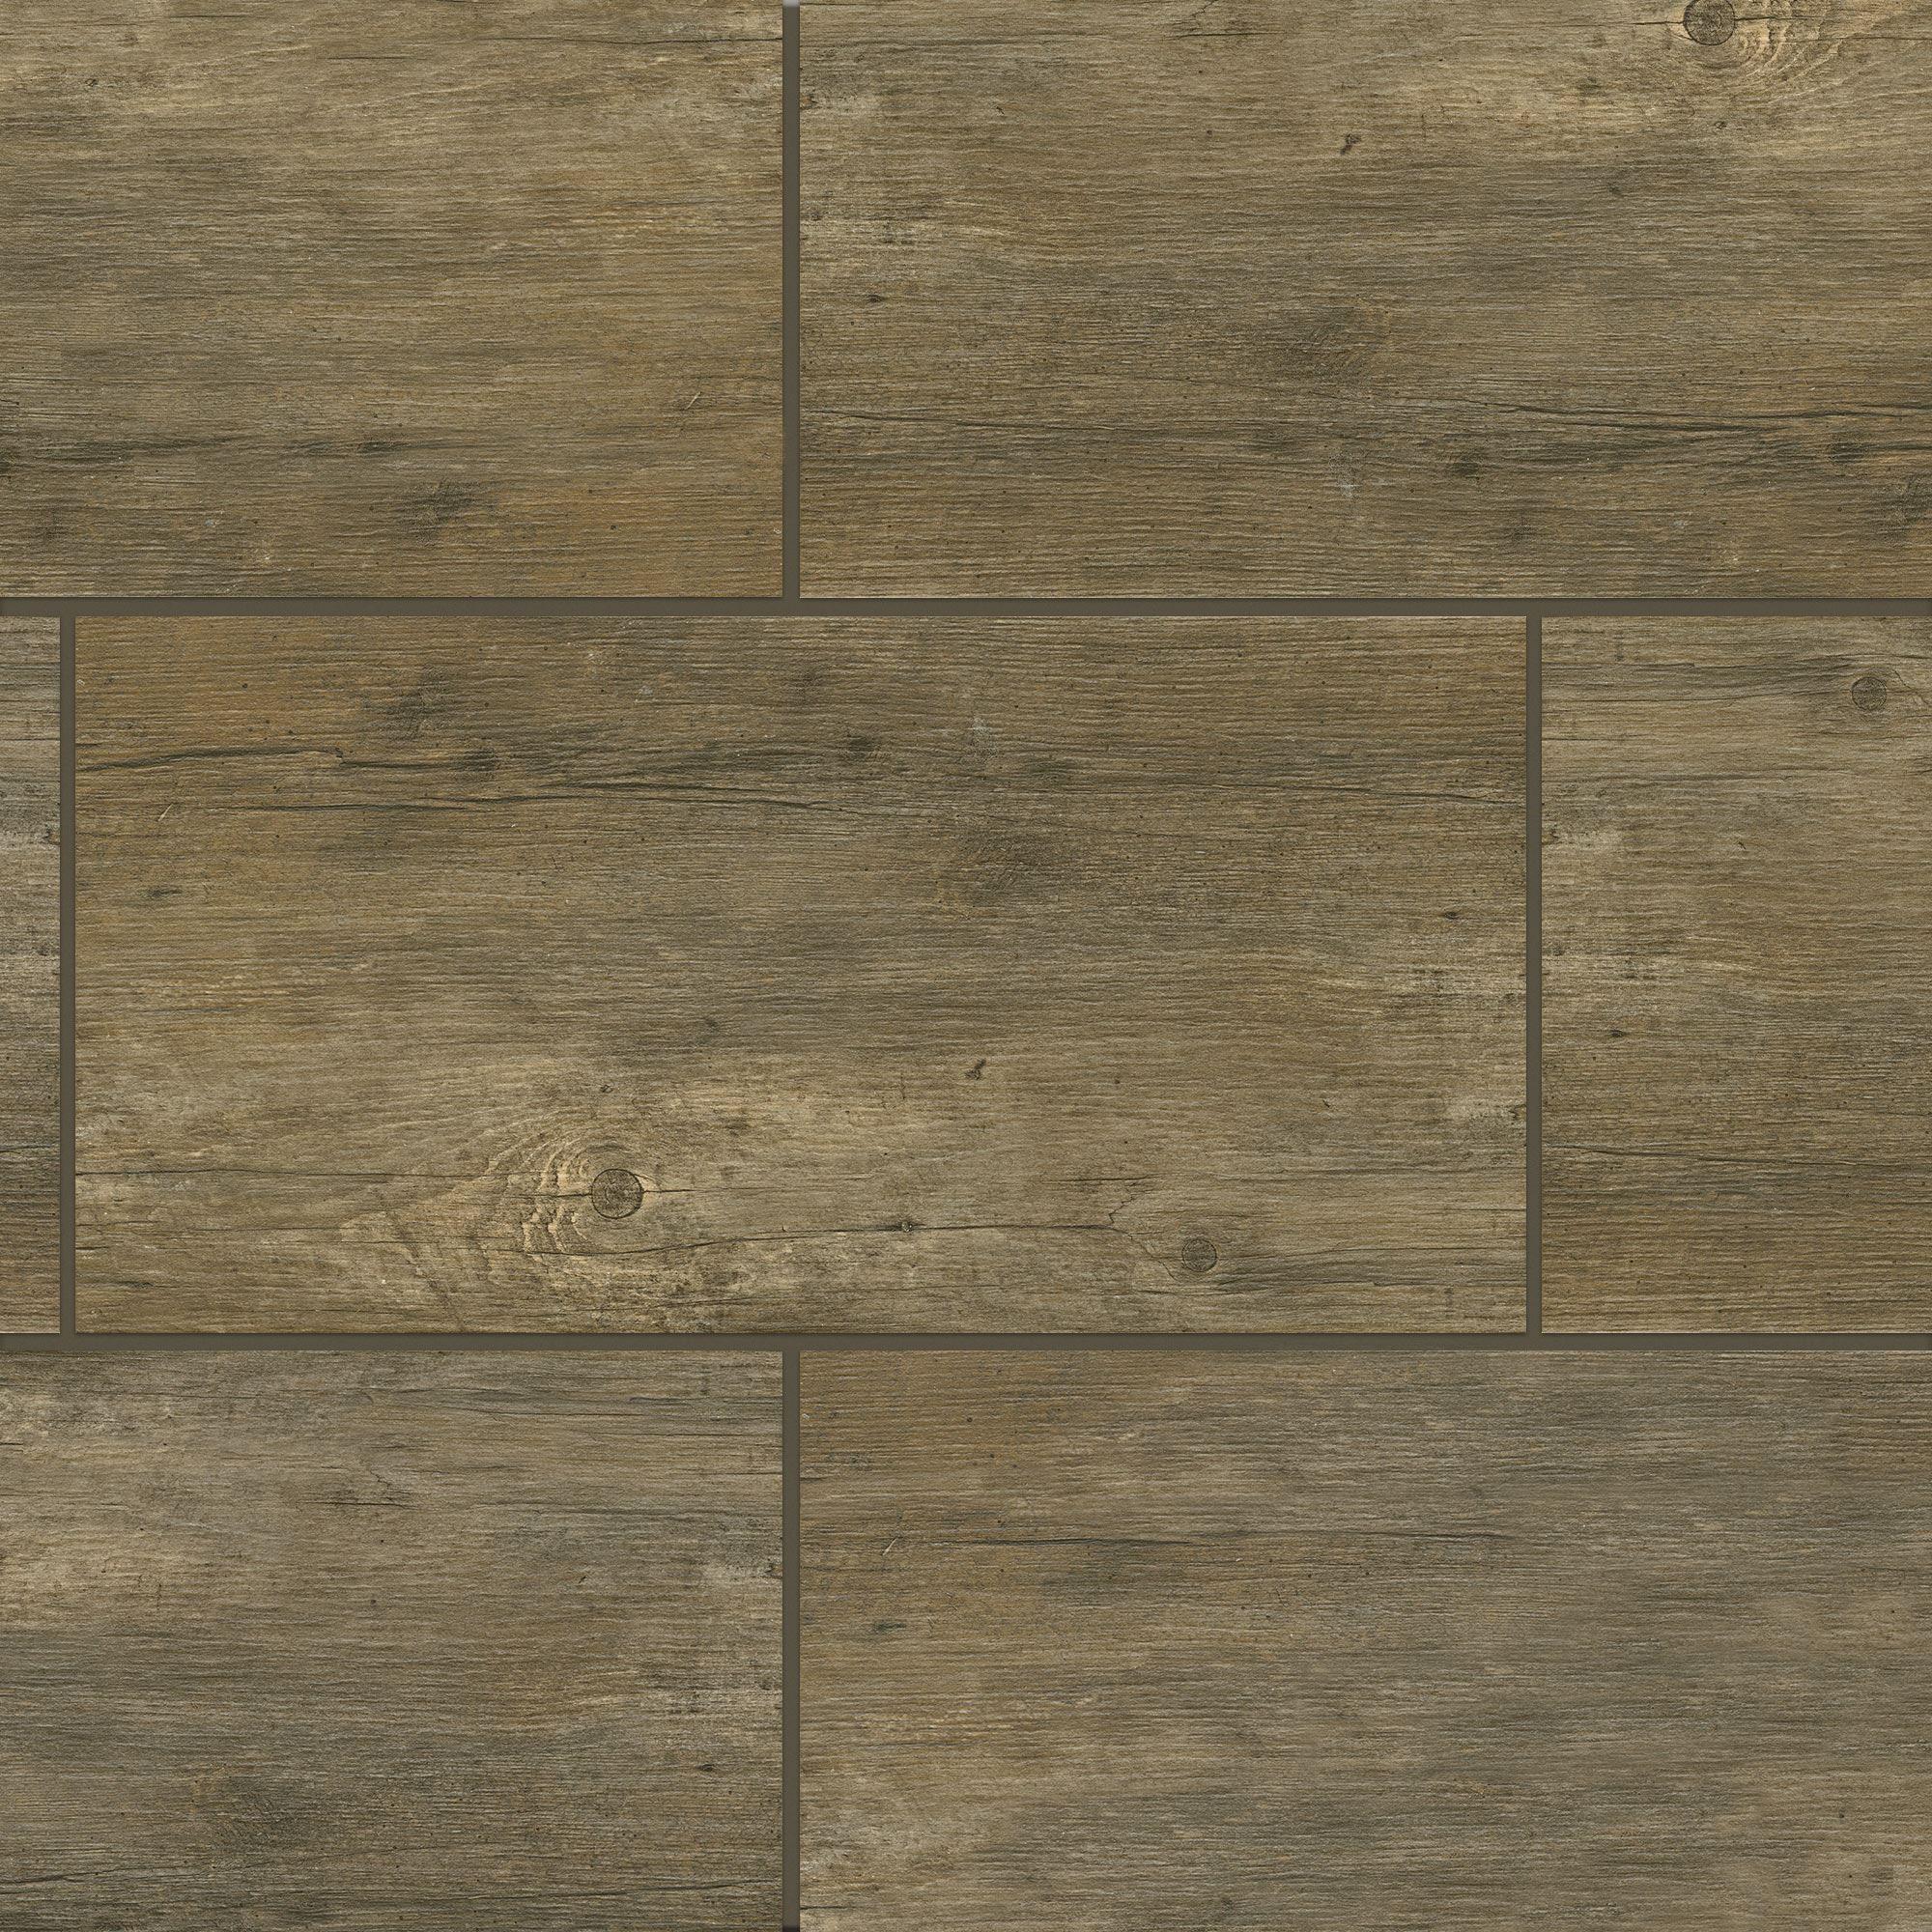 Canal Pier Vinyl Tile Flooring